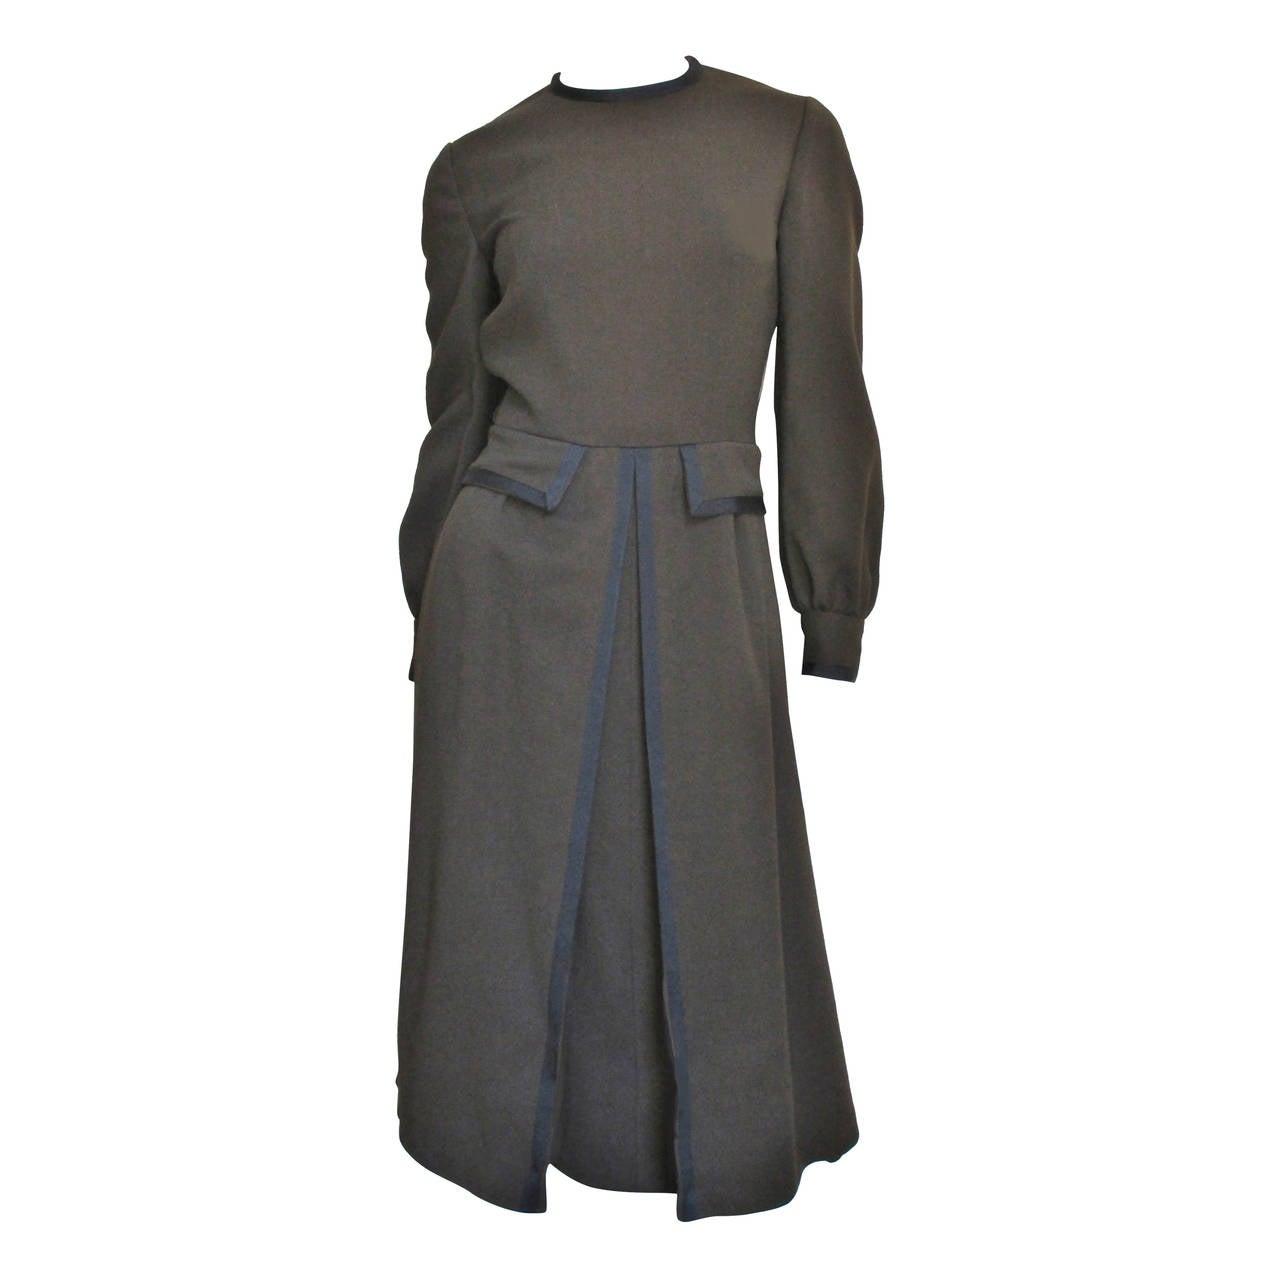 Iconic Geoffrey Beene 1970's Dress 1